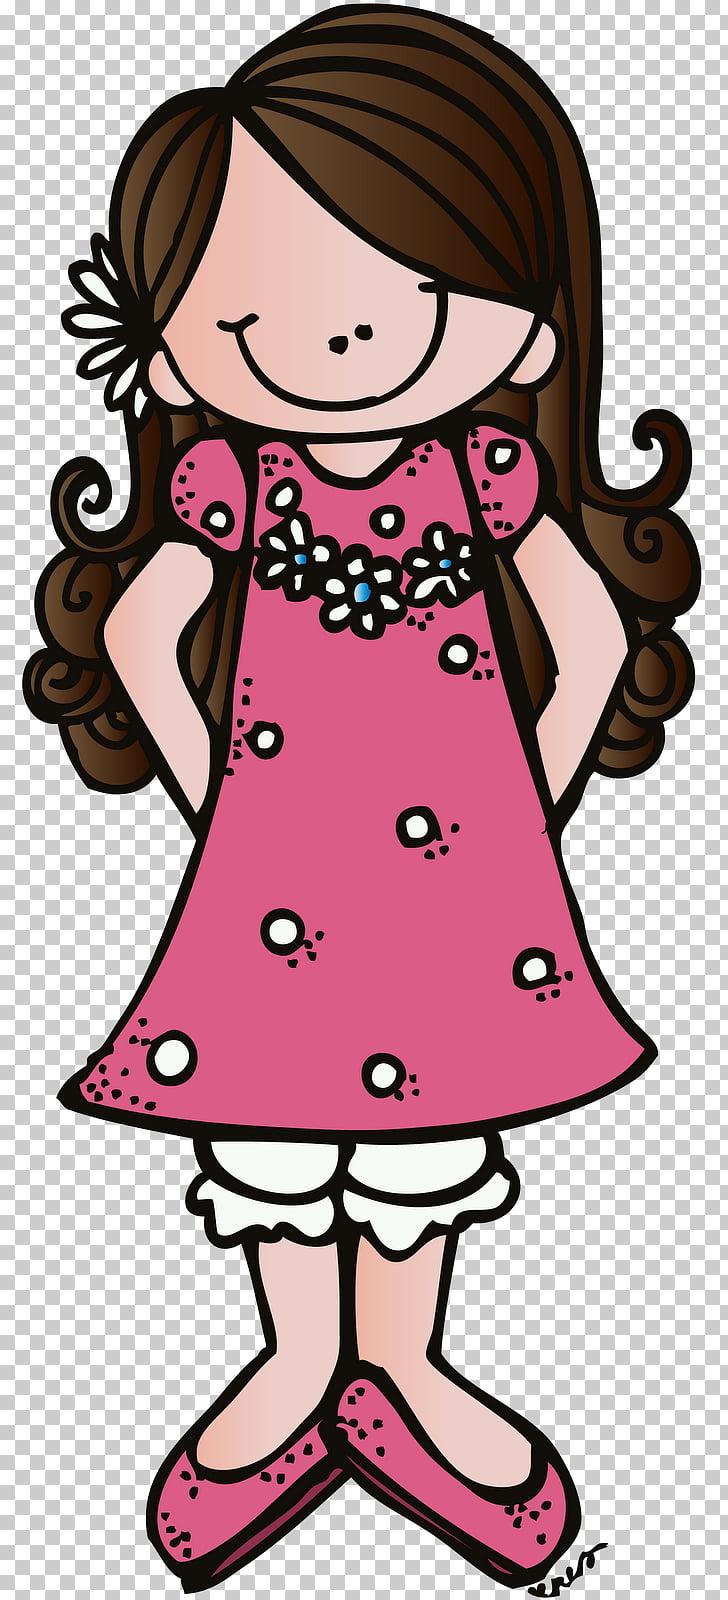 hight resolution of drawing google student teacher melonheadz s png clipart